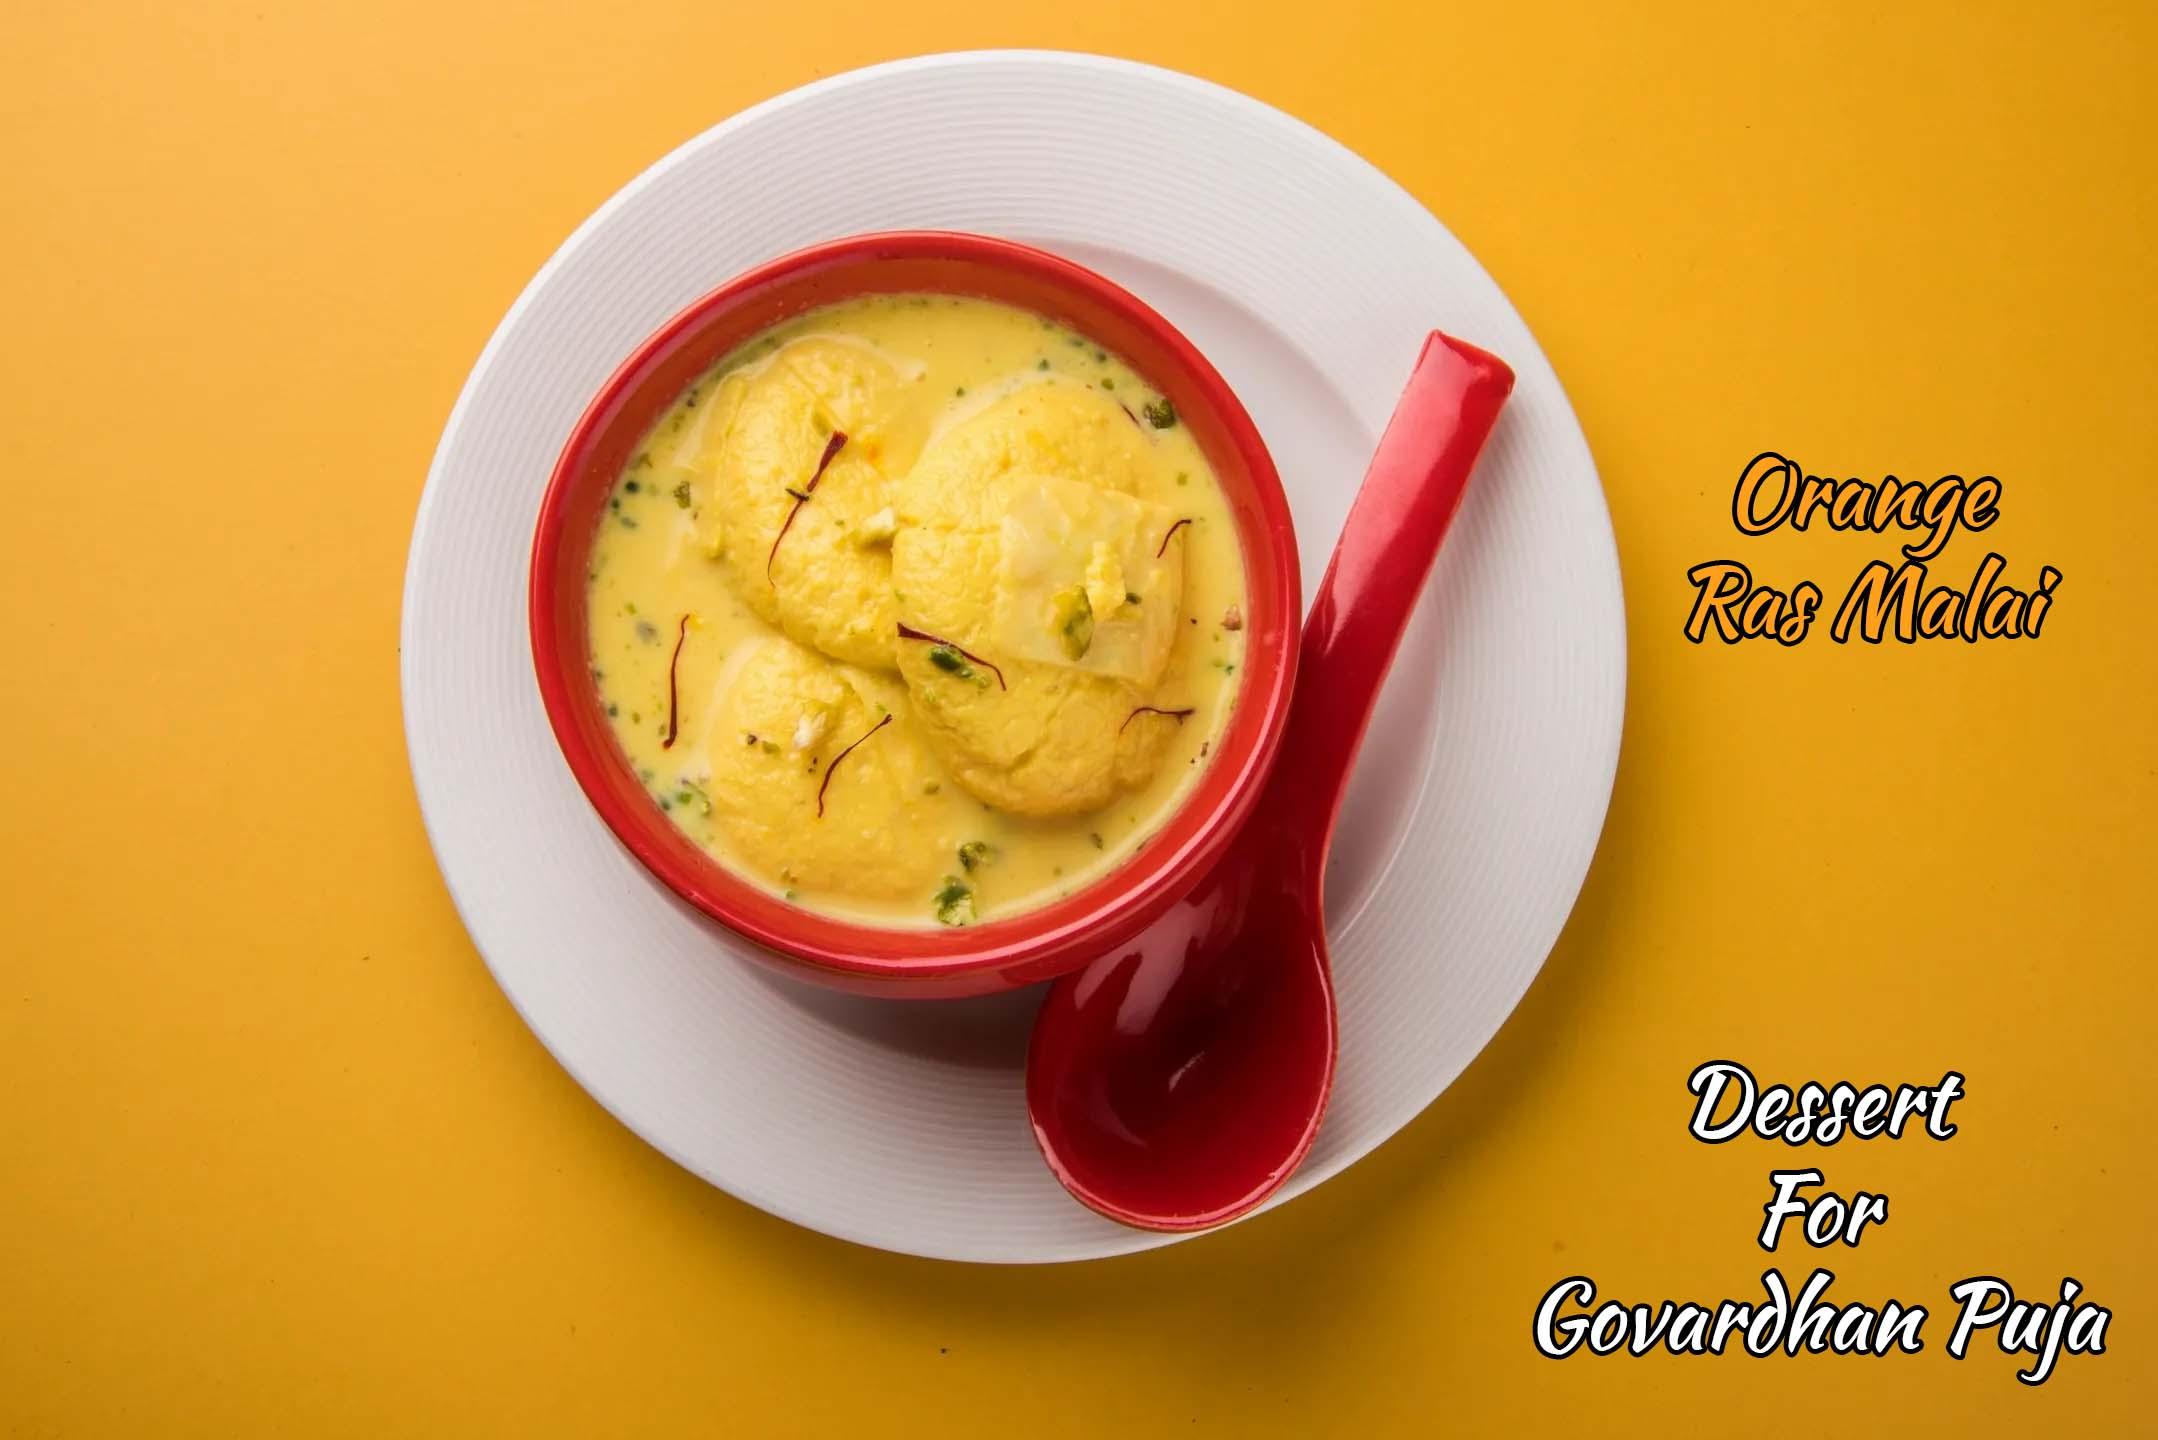 Orange Ras Malai Recipe